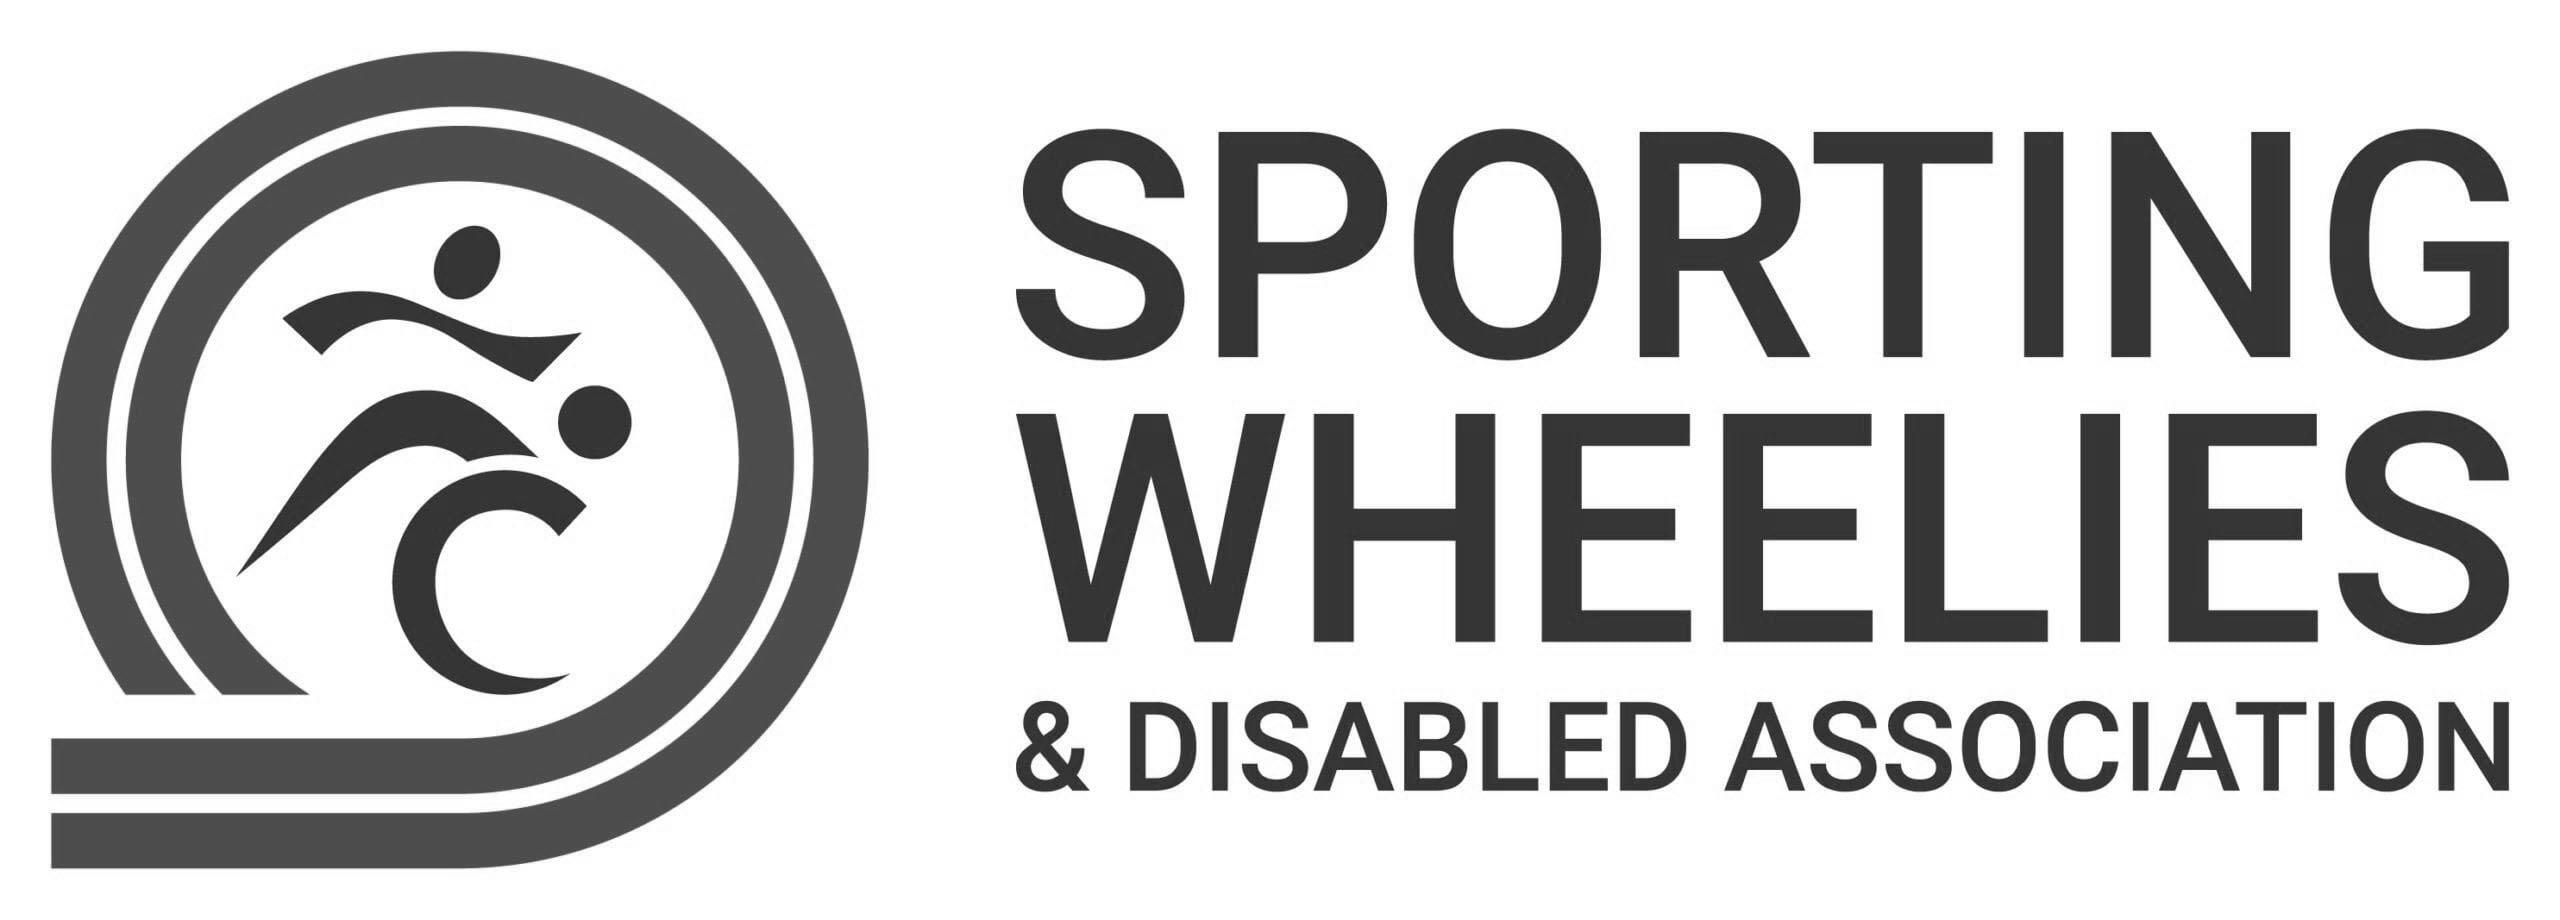 Sporting Wheelies